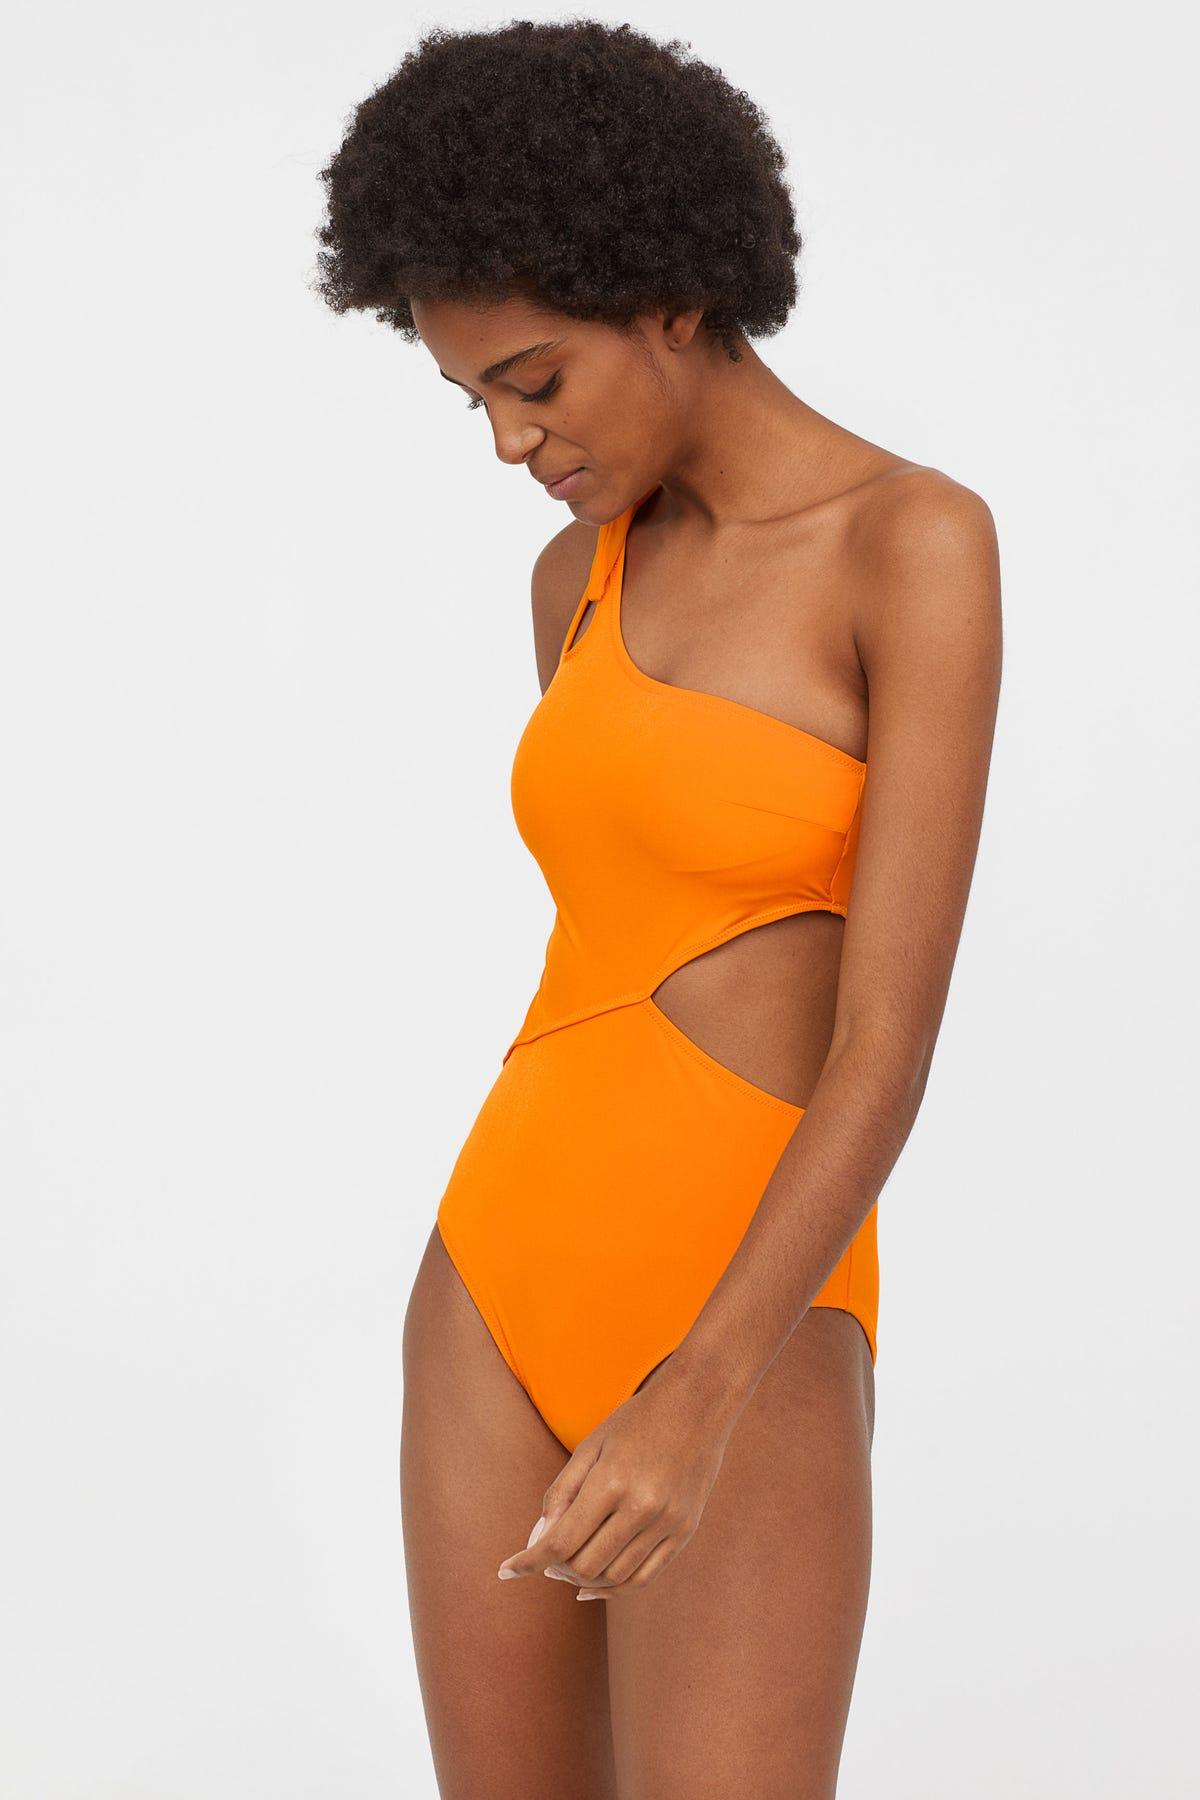 6c7f8c851a6 New Swimsuit Trends 2019 Cool Bikini, One-Piece Styles